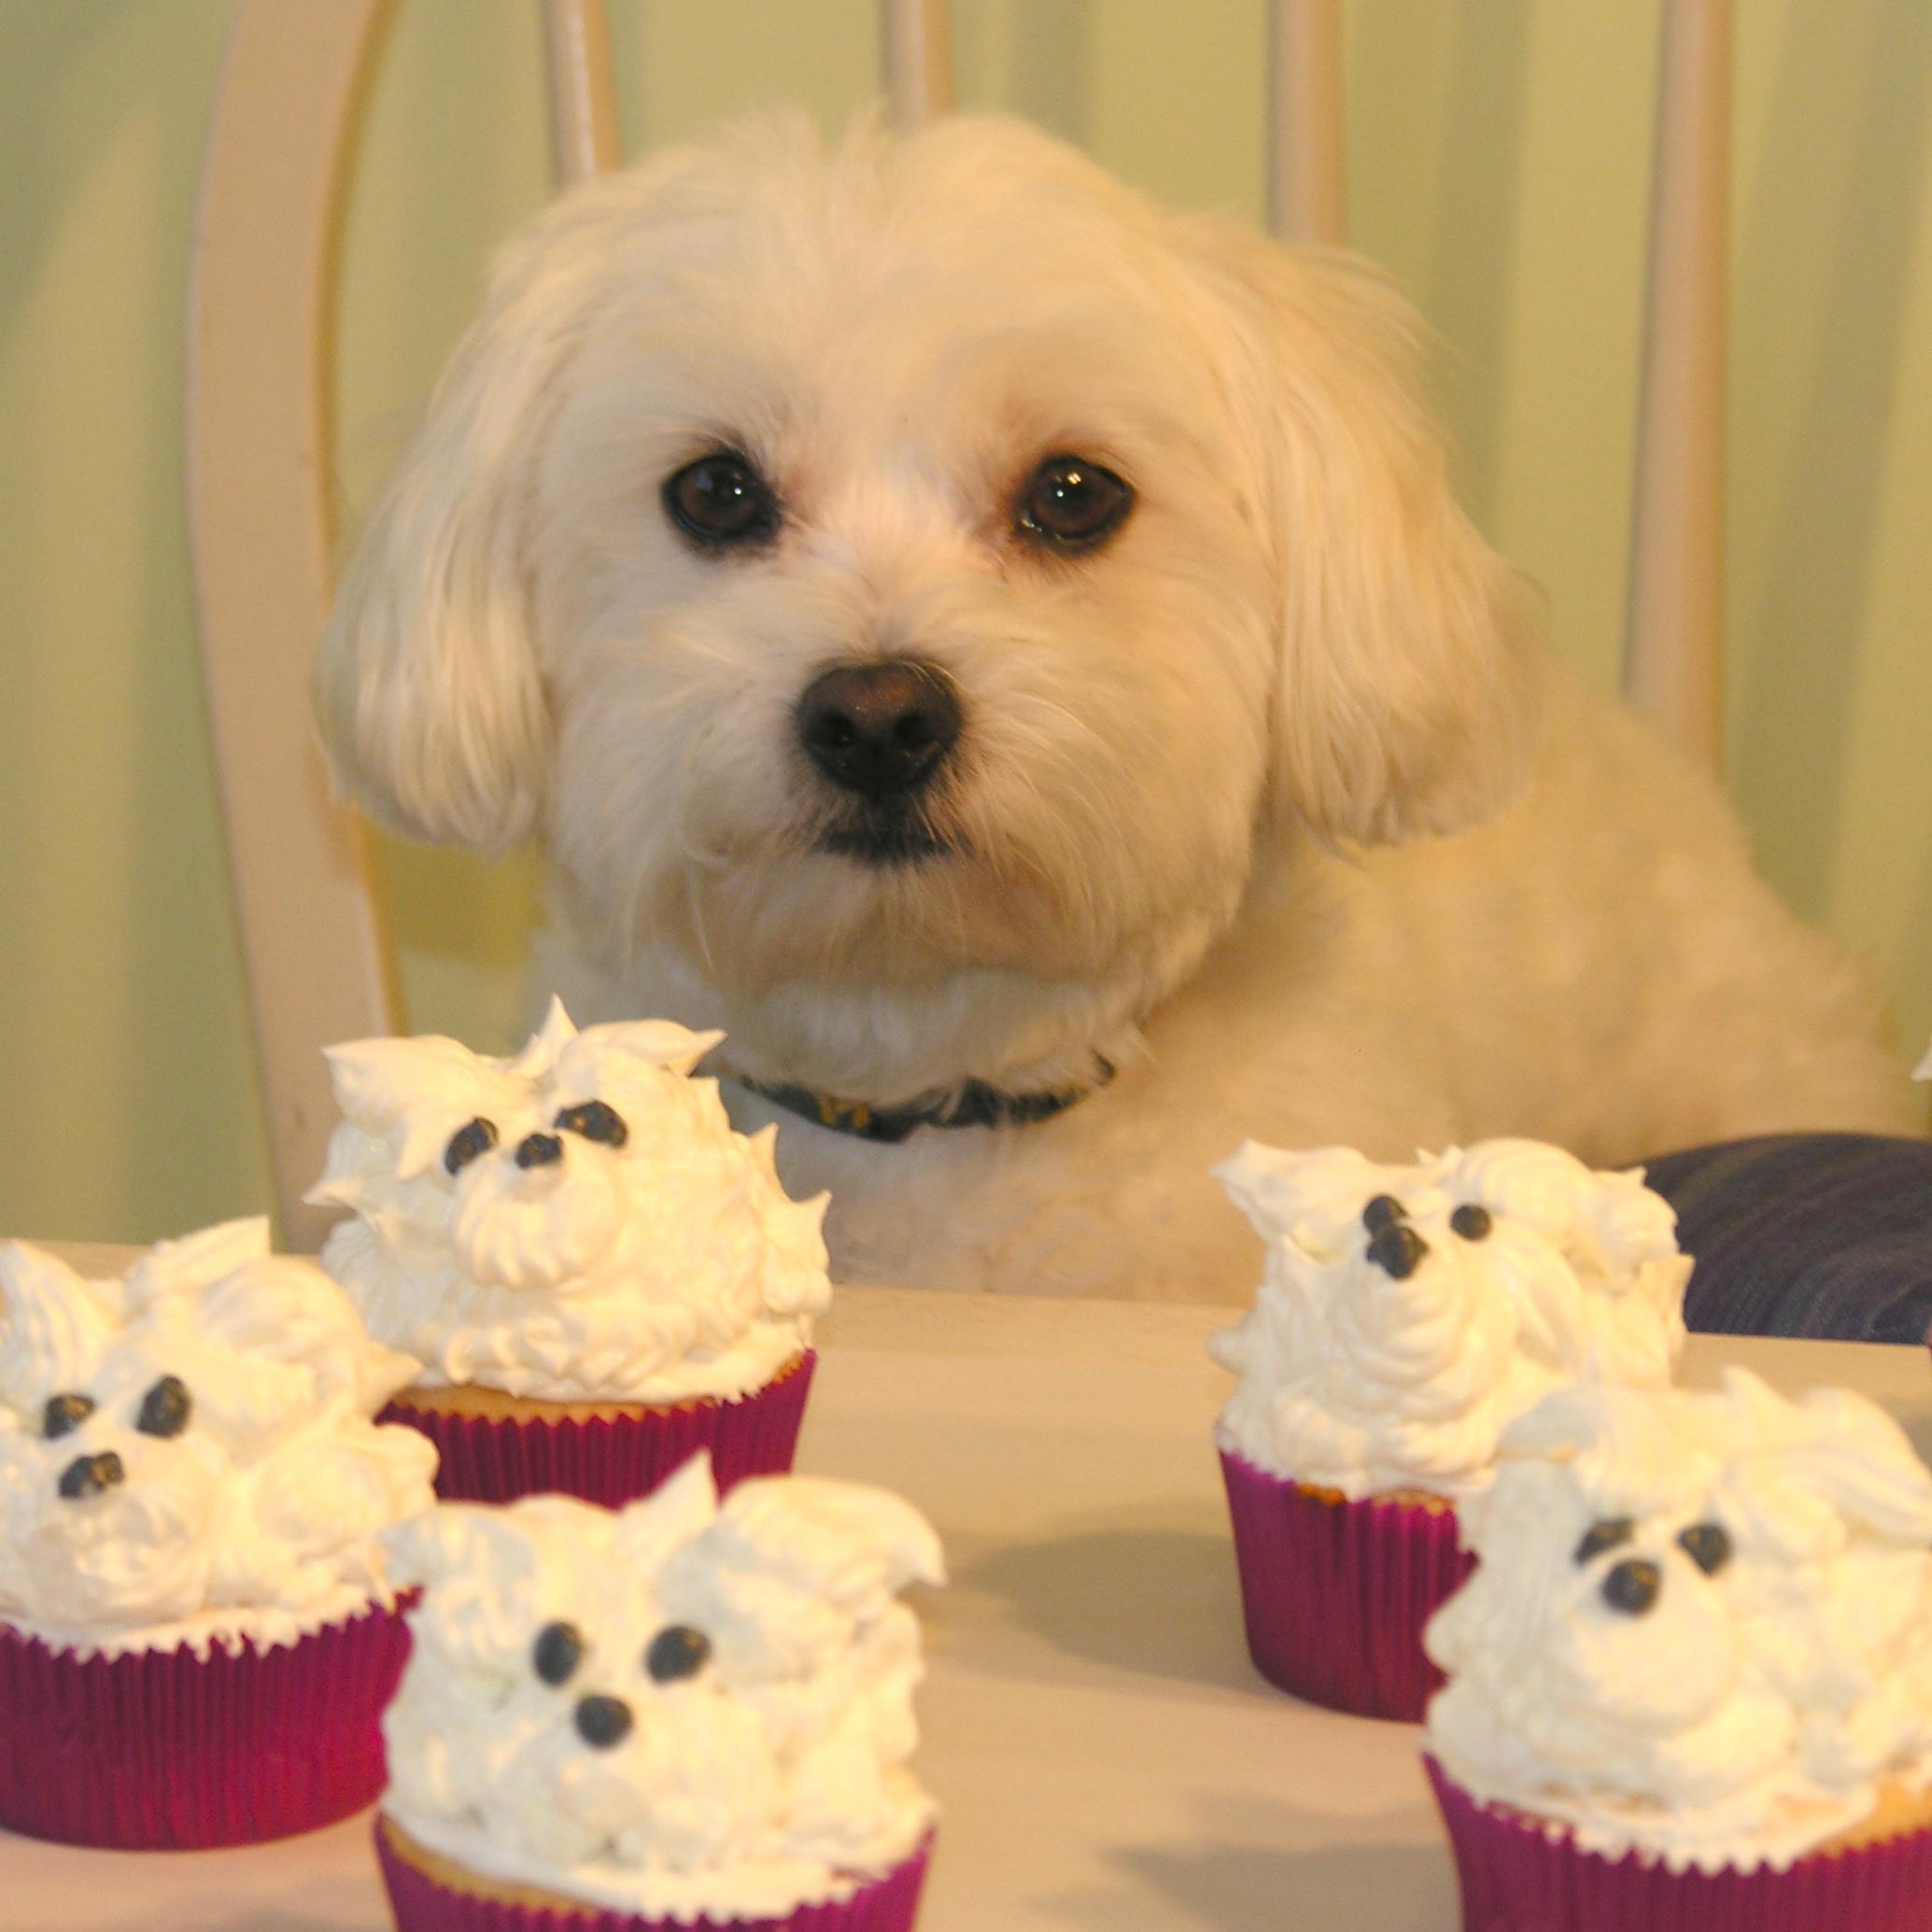 Casper And His White dog Cupcakes